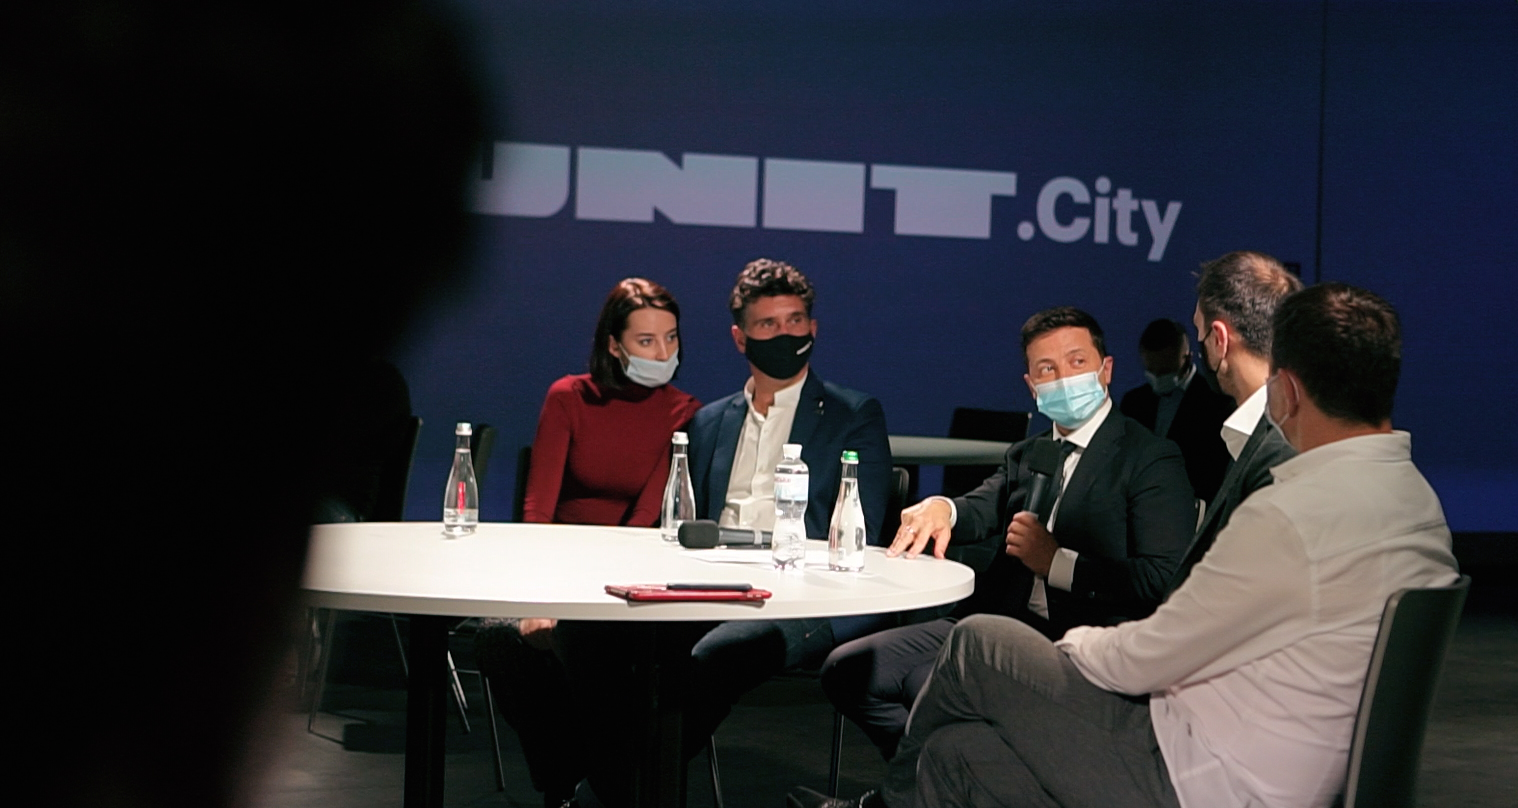 Владимир Зеленский на встрече со стартаперами в UNIT.City